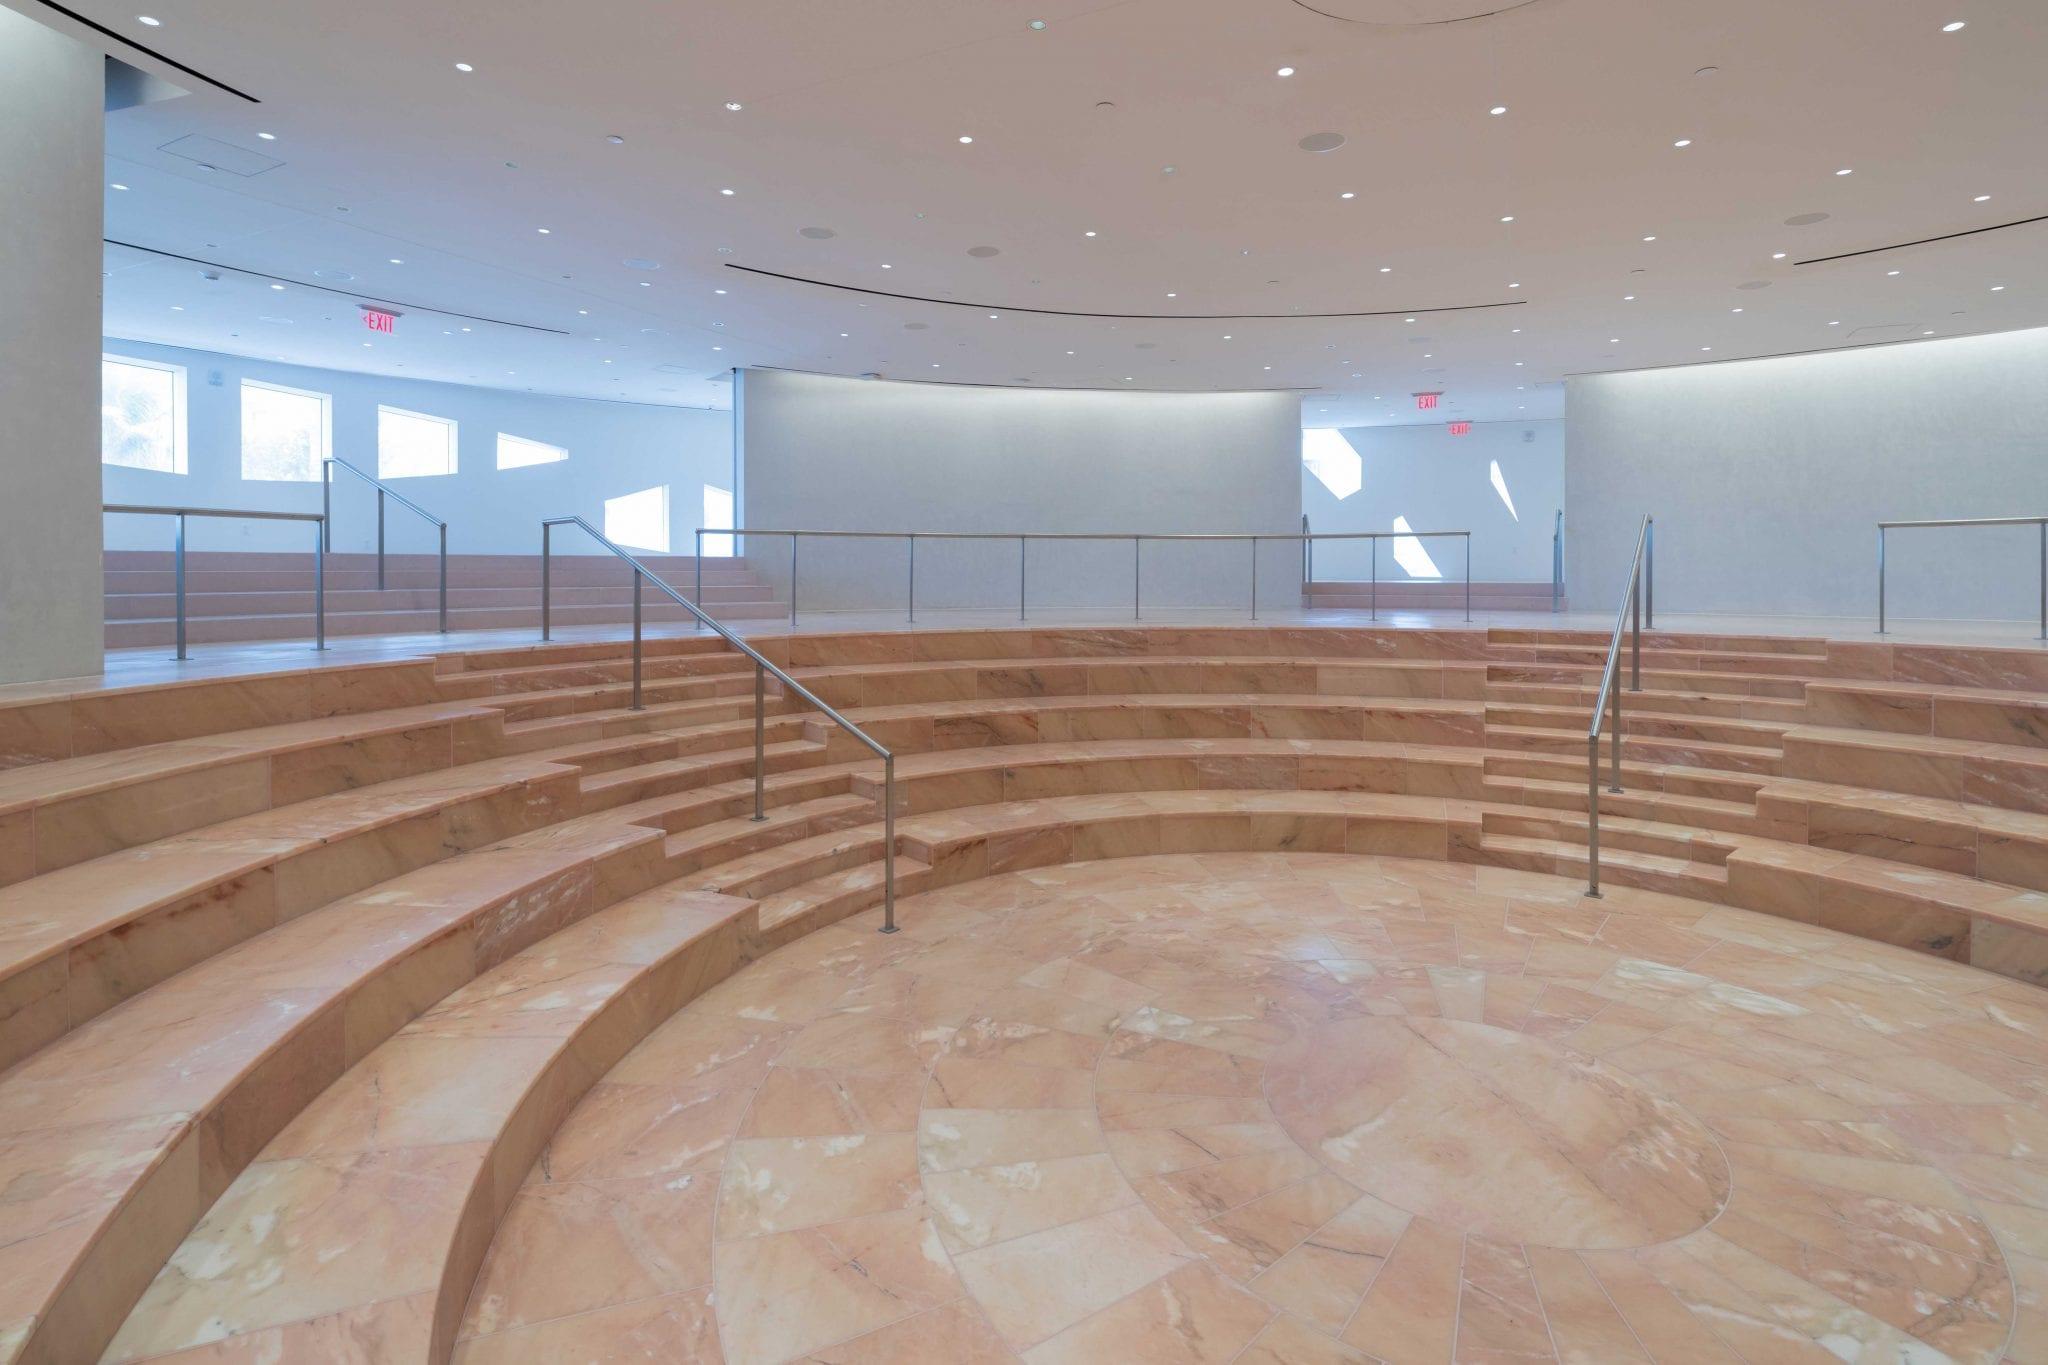 14_Faena-Forum-Amphitheater-Lobby_Iwan-Baan